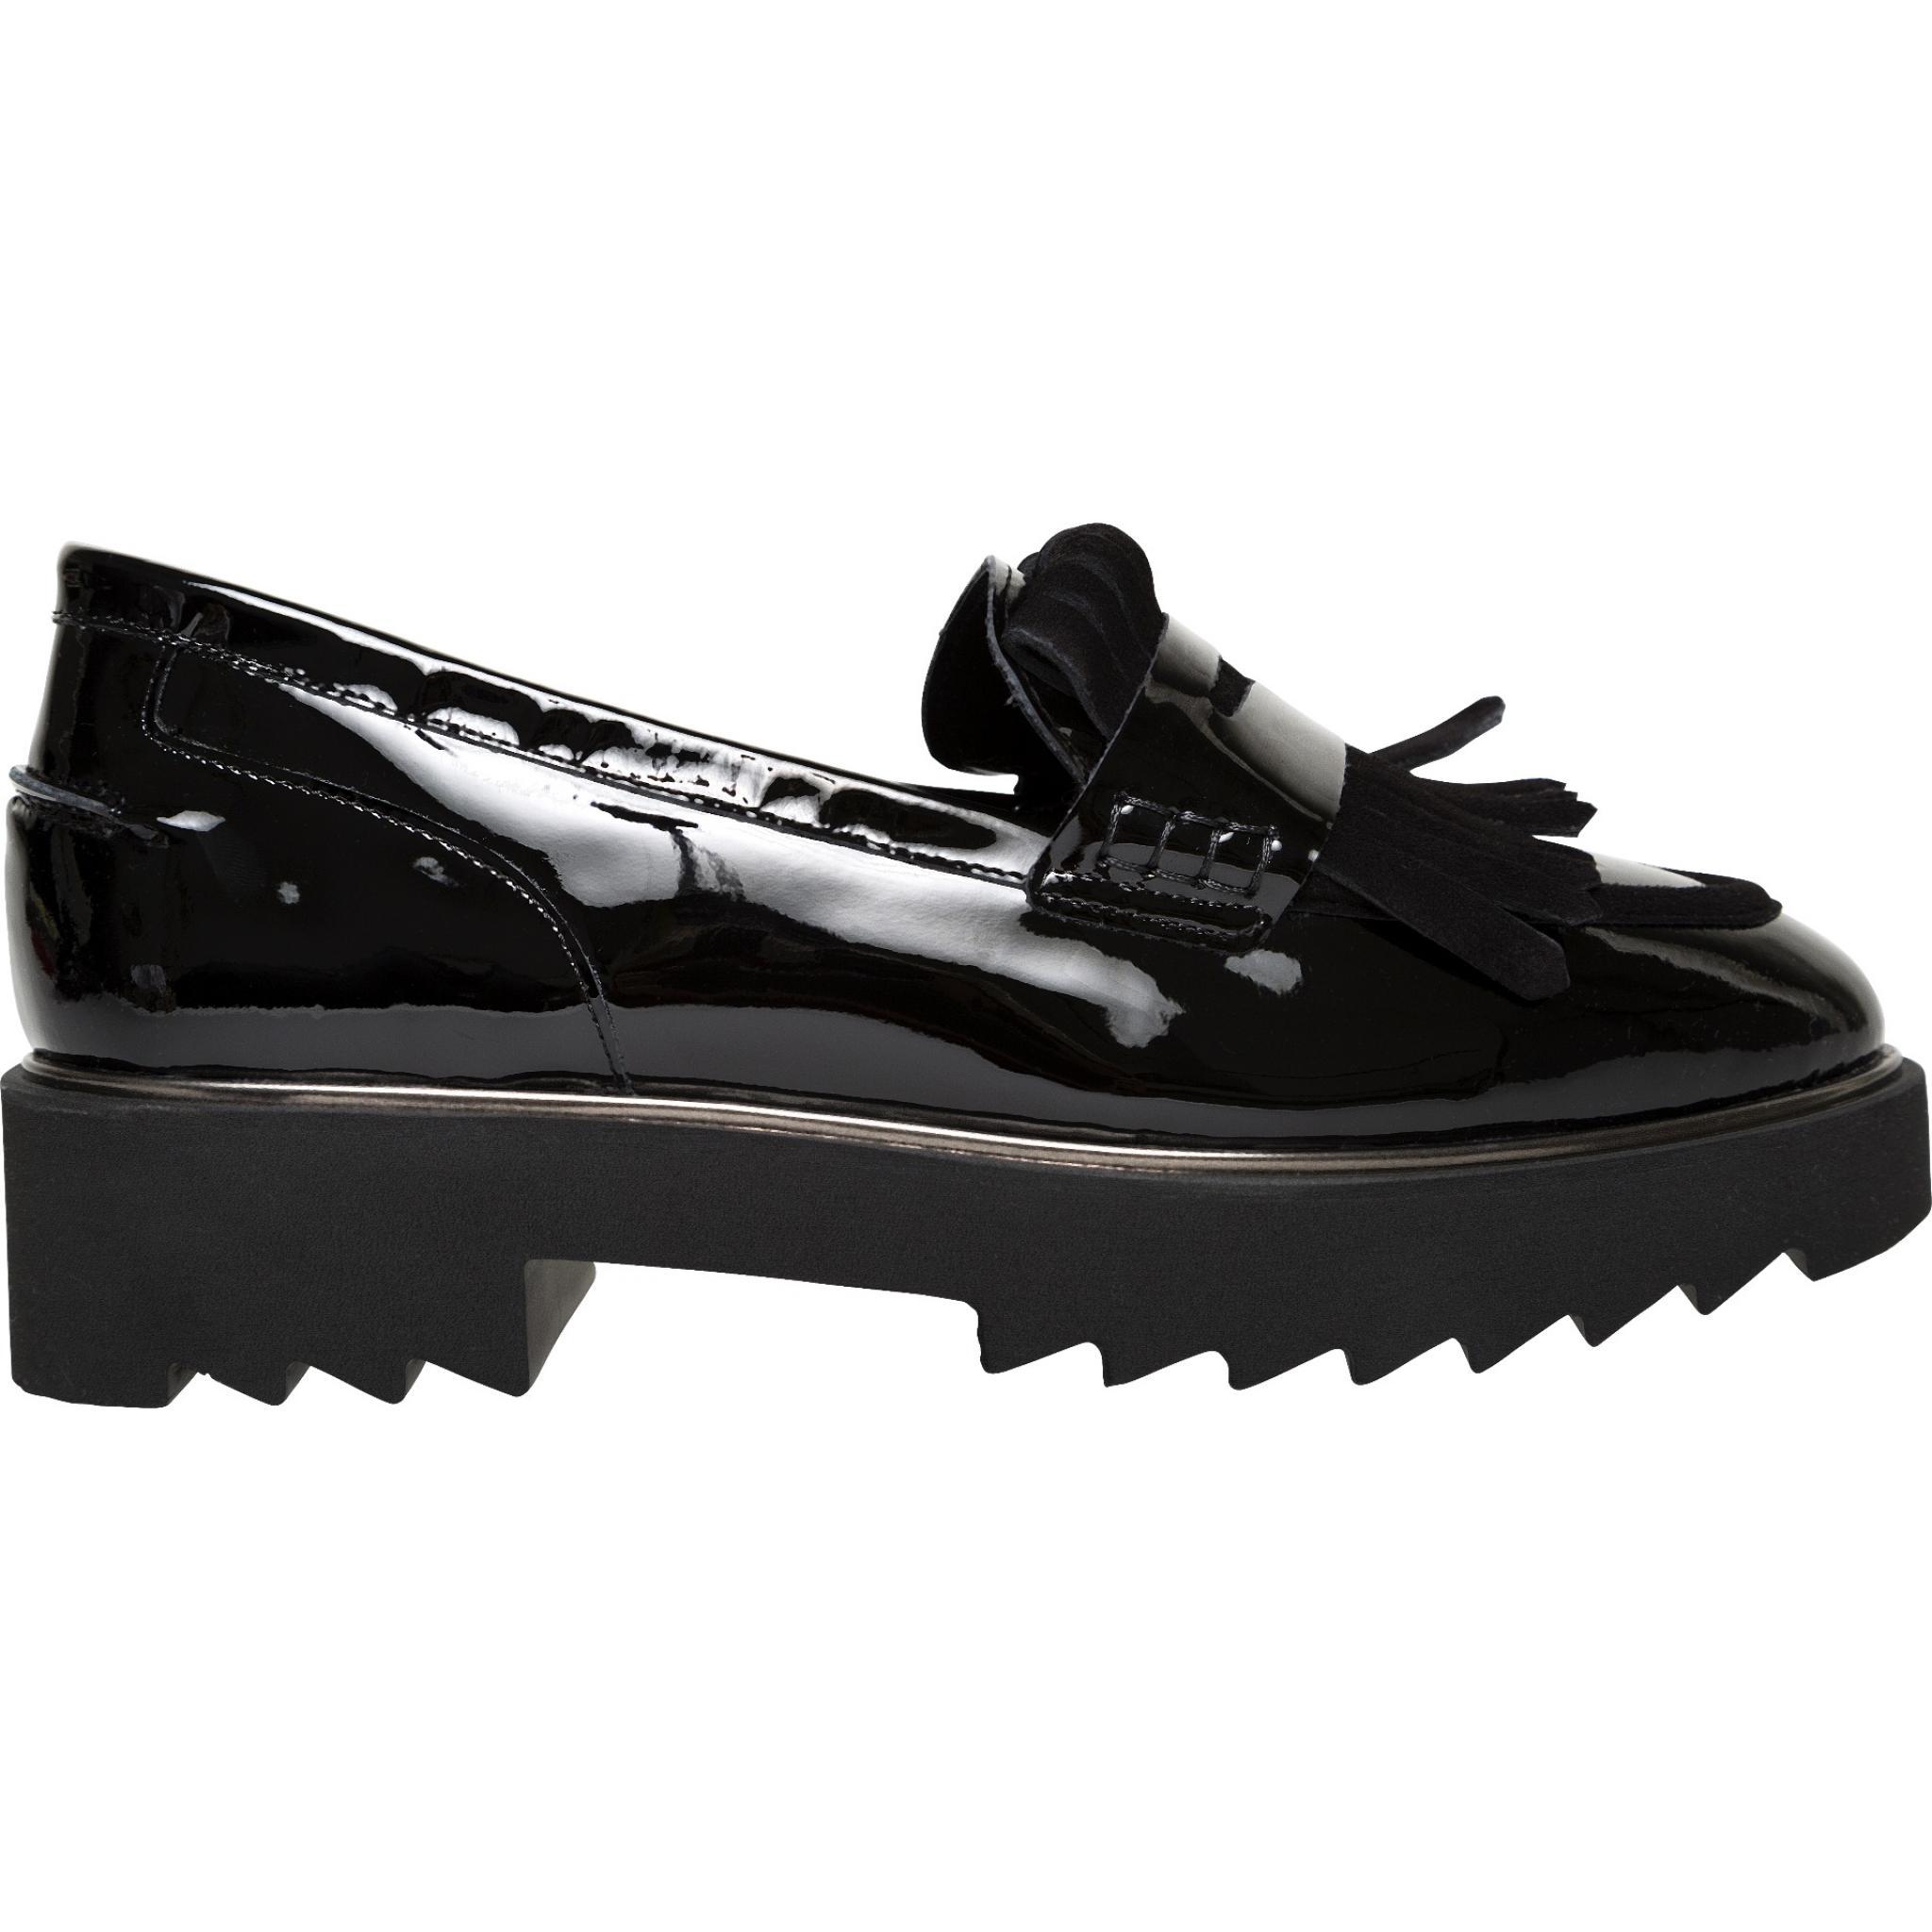 Slippers in Lackleder mit breiter Profilsohle-0